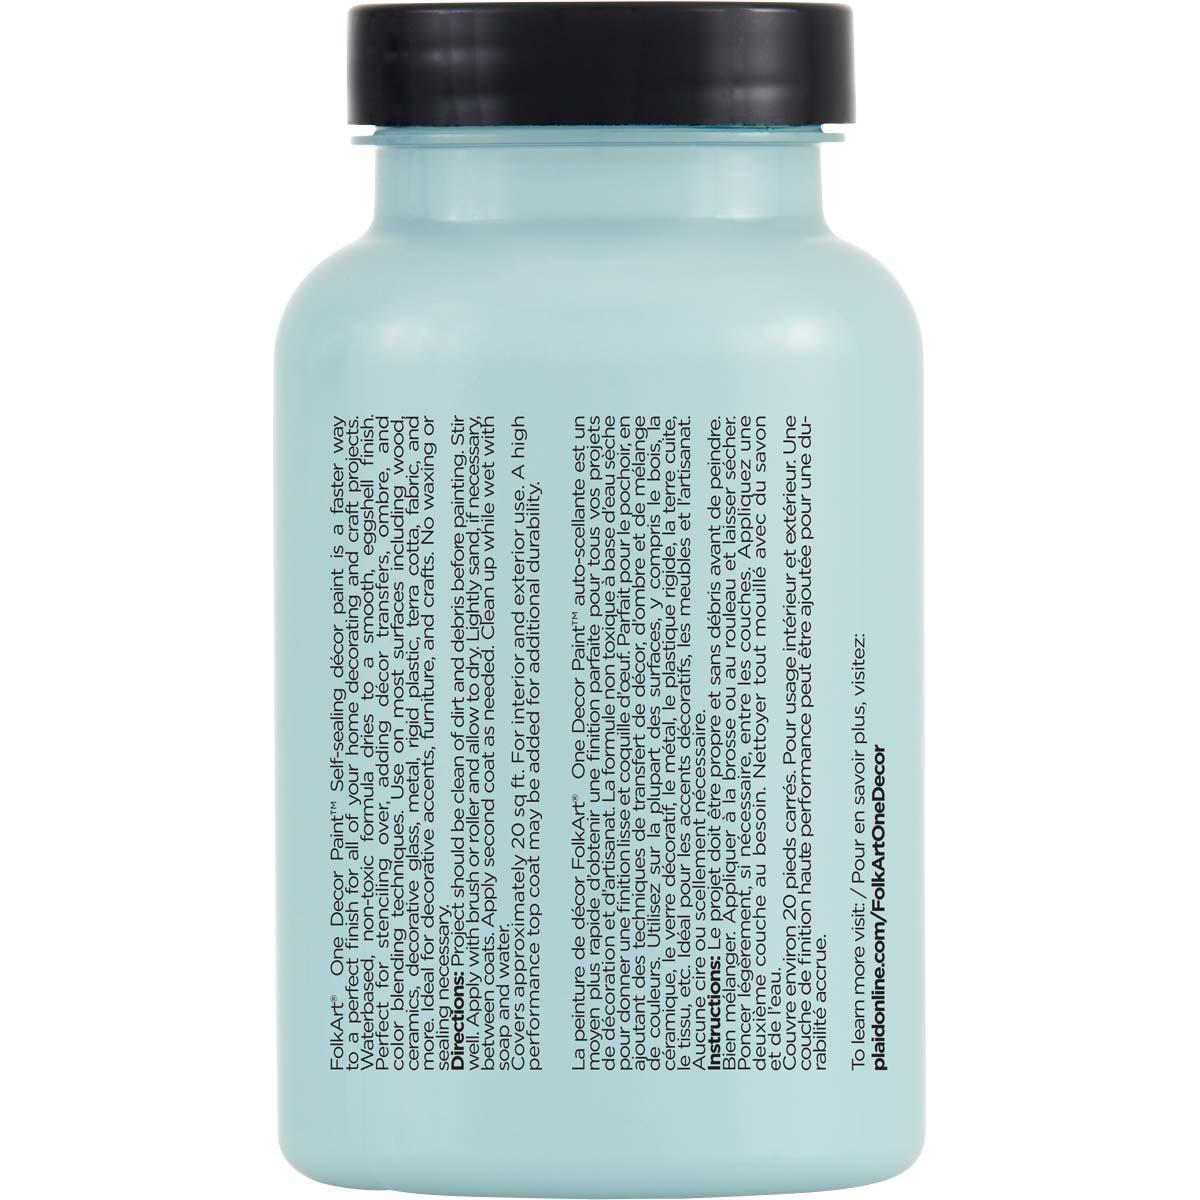 FolkArt ® One Décor Paint™ - Iced Turquoise, 8 oz. - 36067